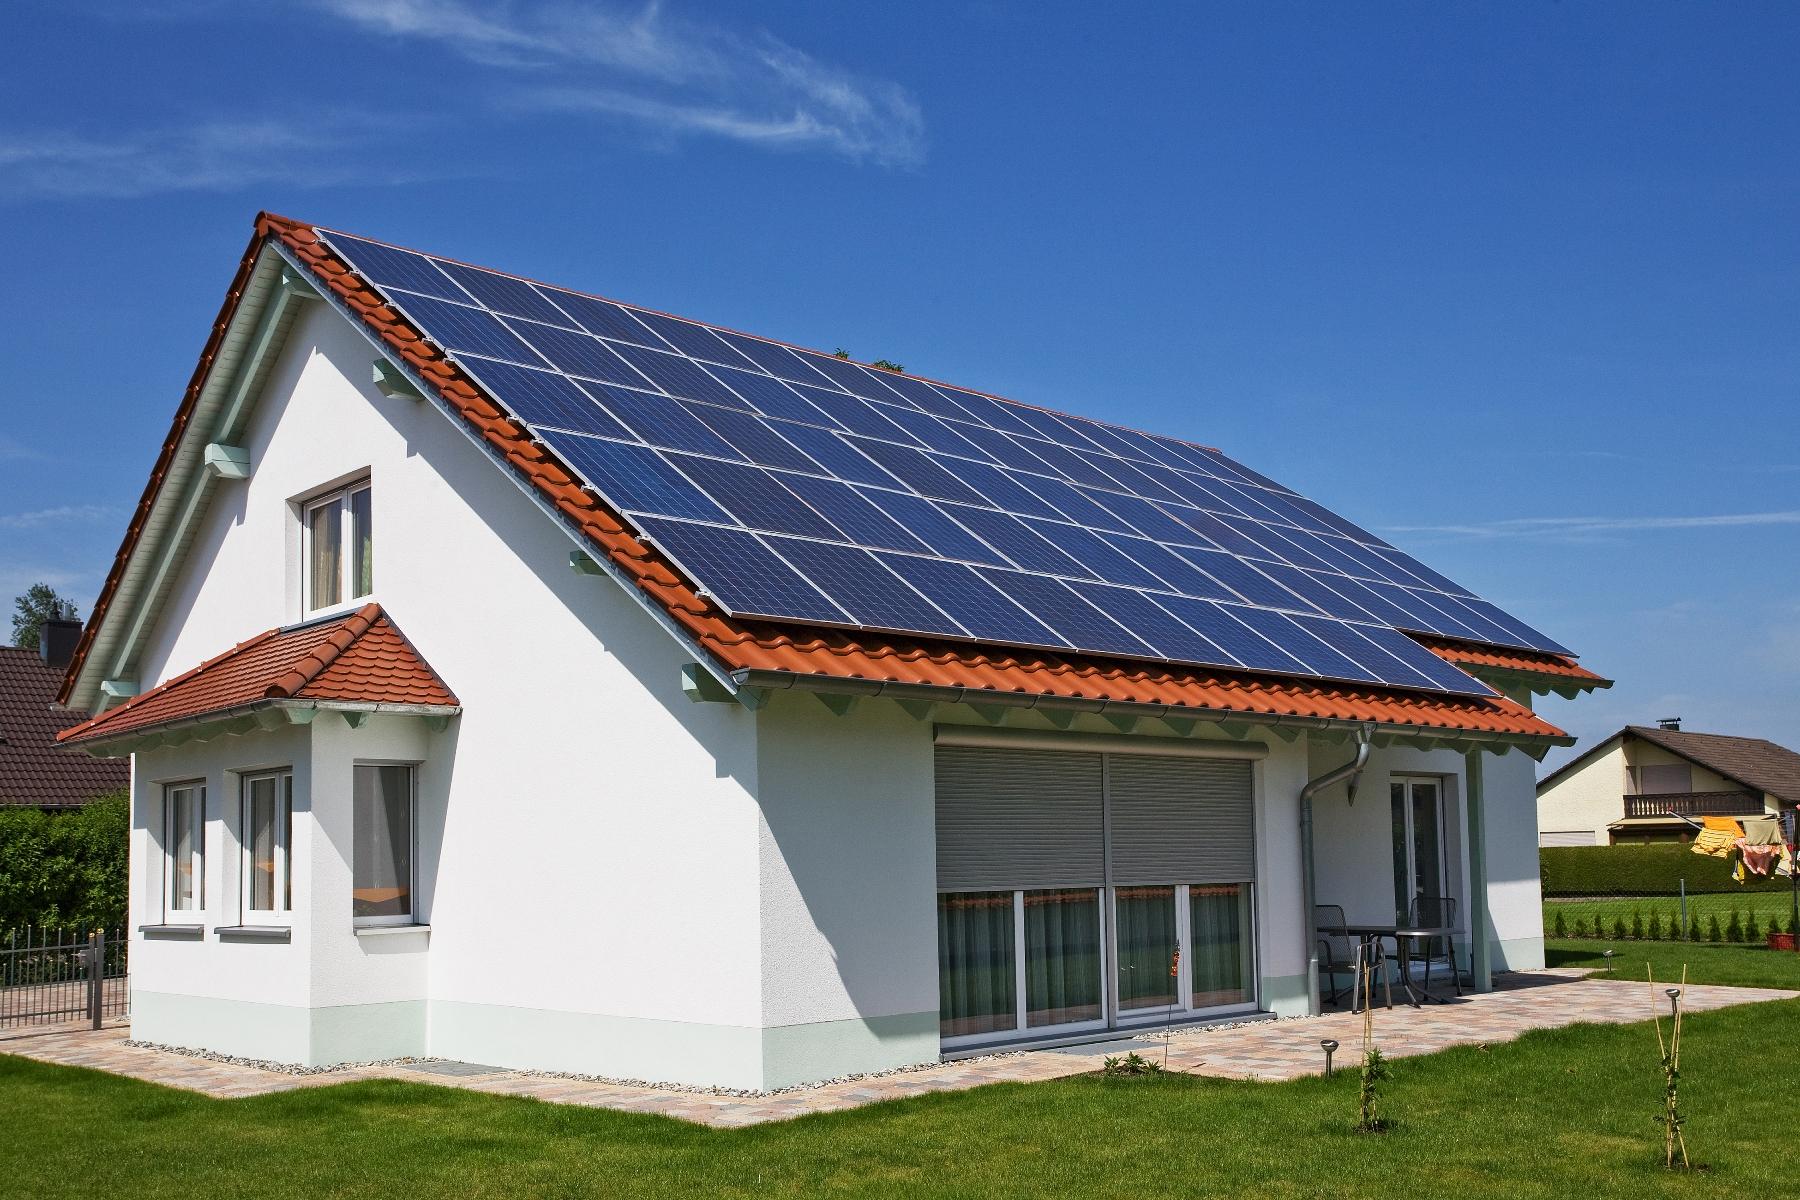 La energia solar el futuro?